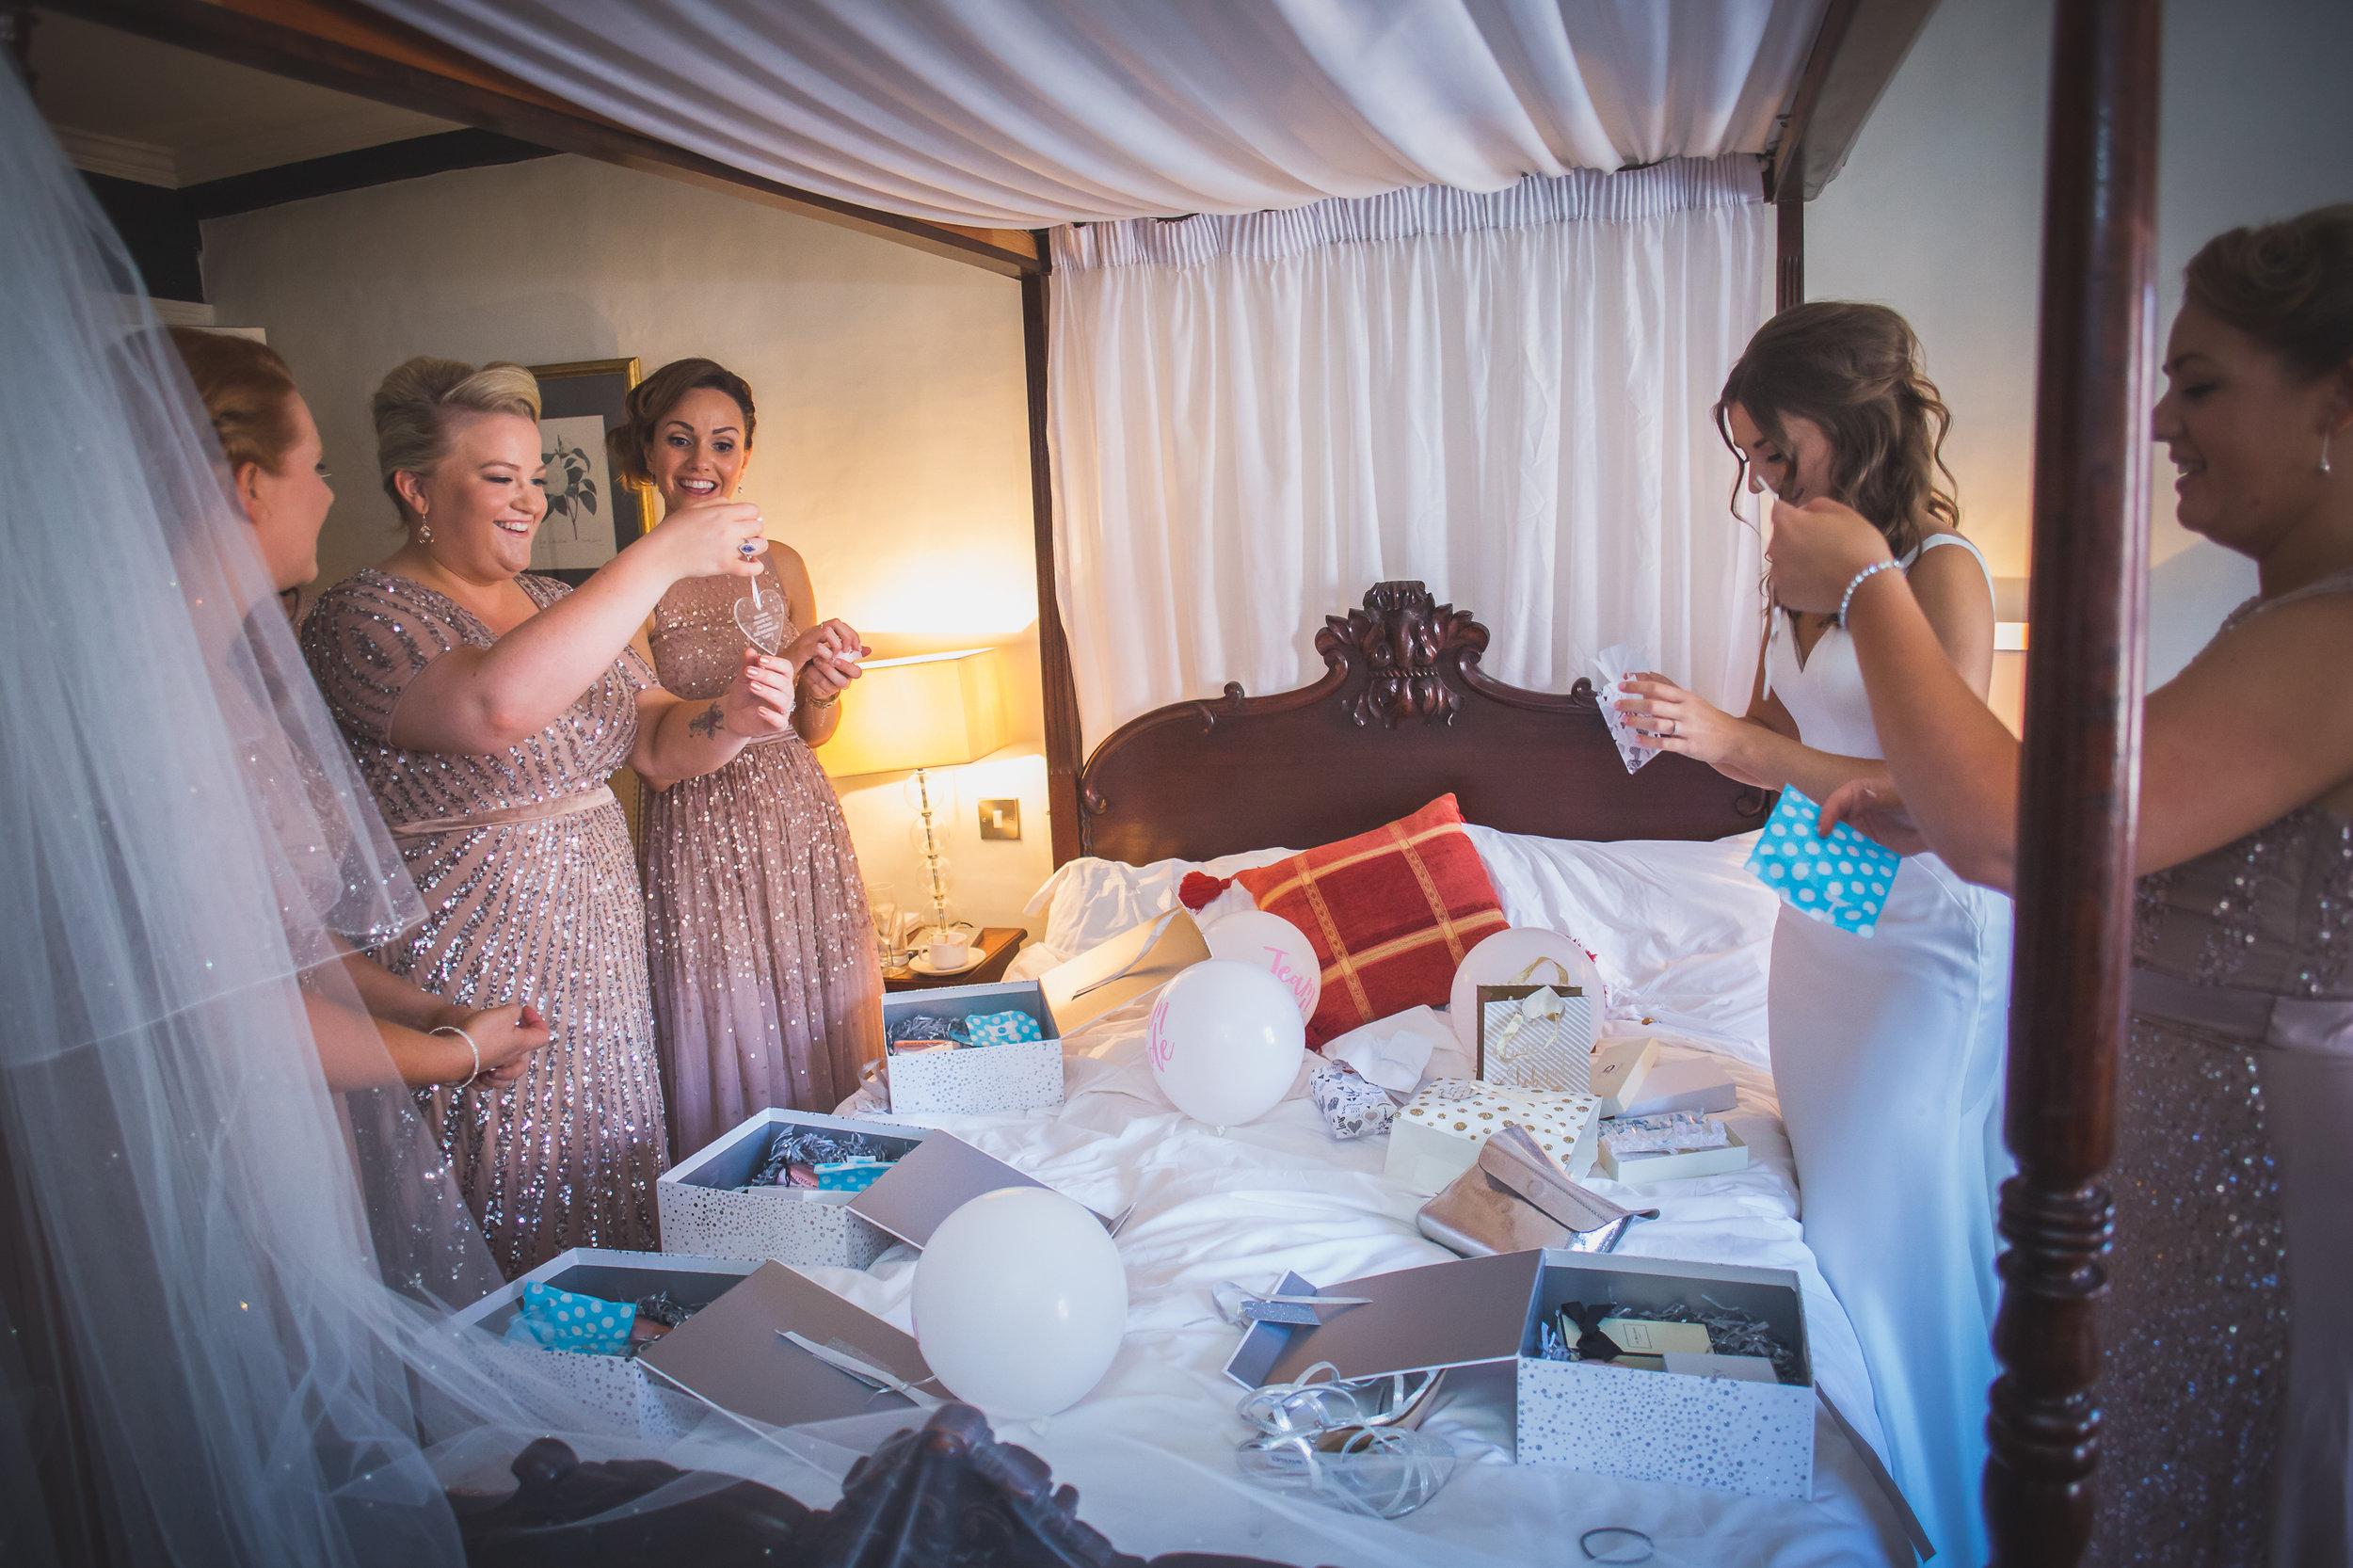 Grittenham Barn female wedding photographers west sussex petworth social-17.jpg